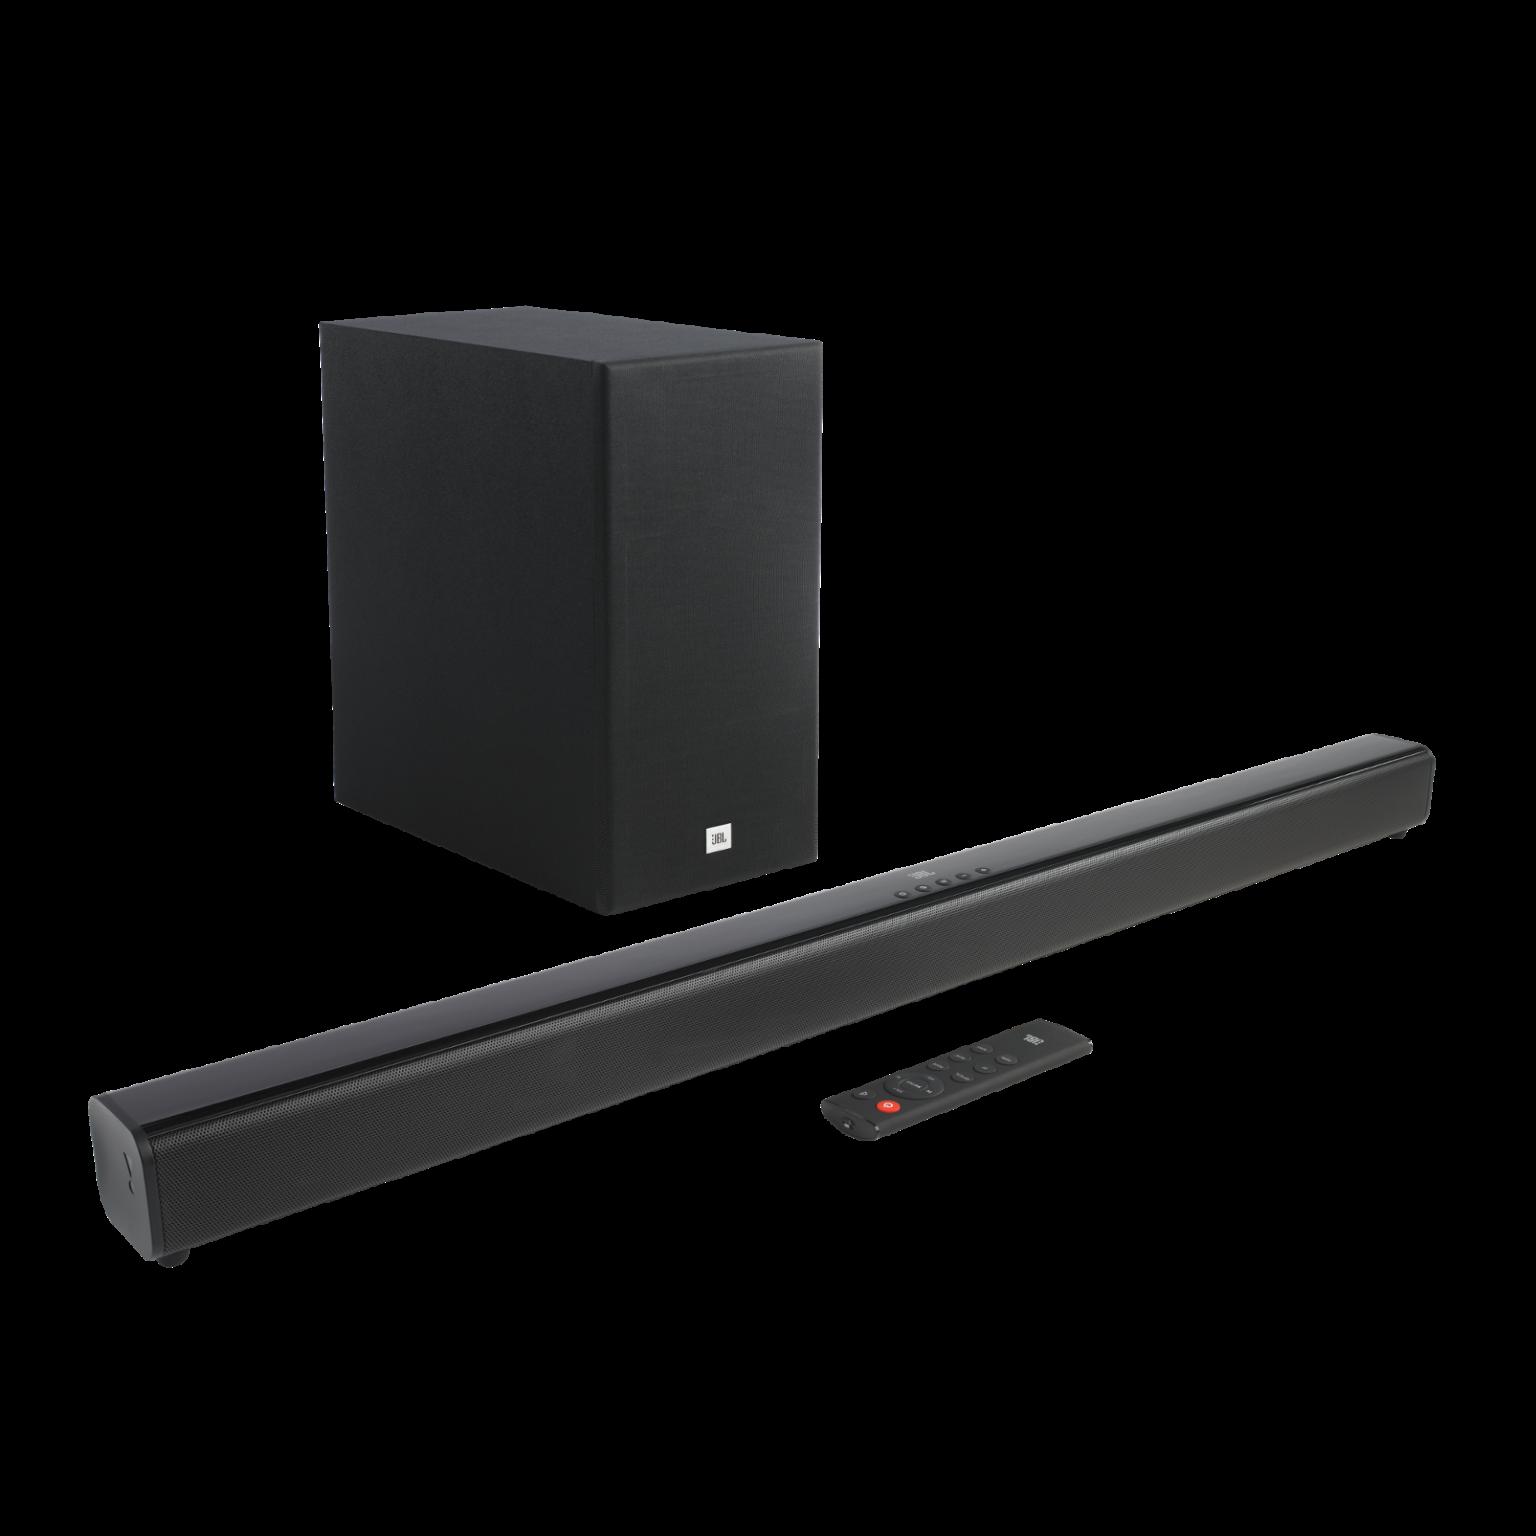 JBL Cinema SB160, Soundbar, Bluetooth, Wireless Subwoofer (Black)